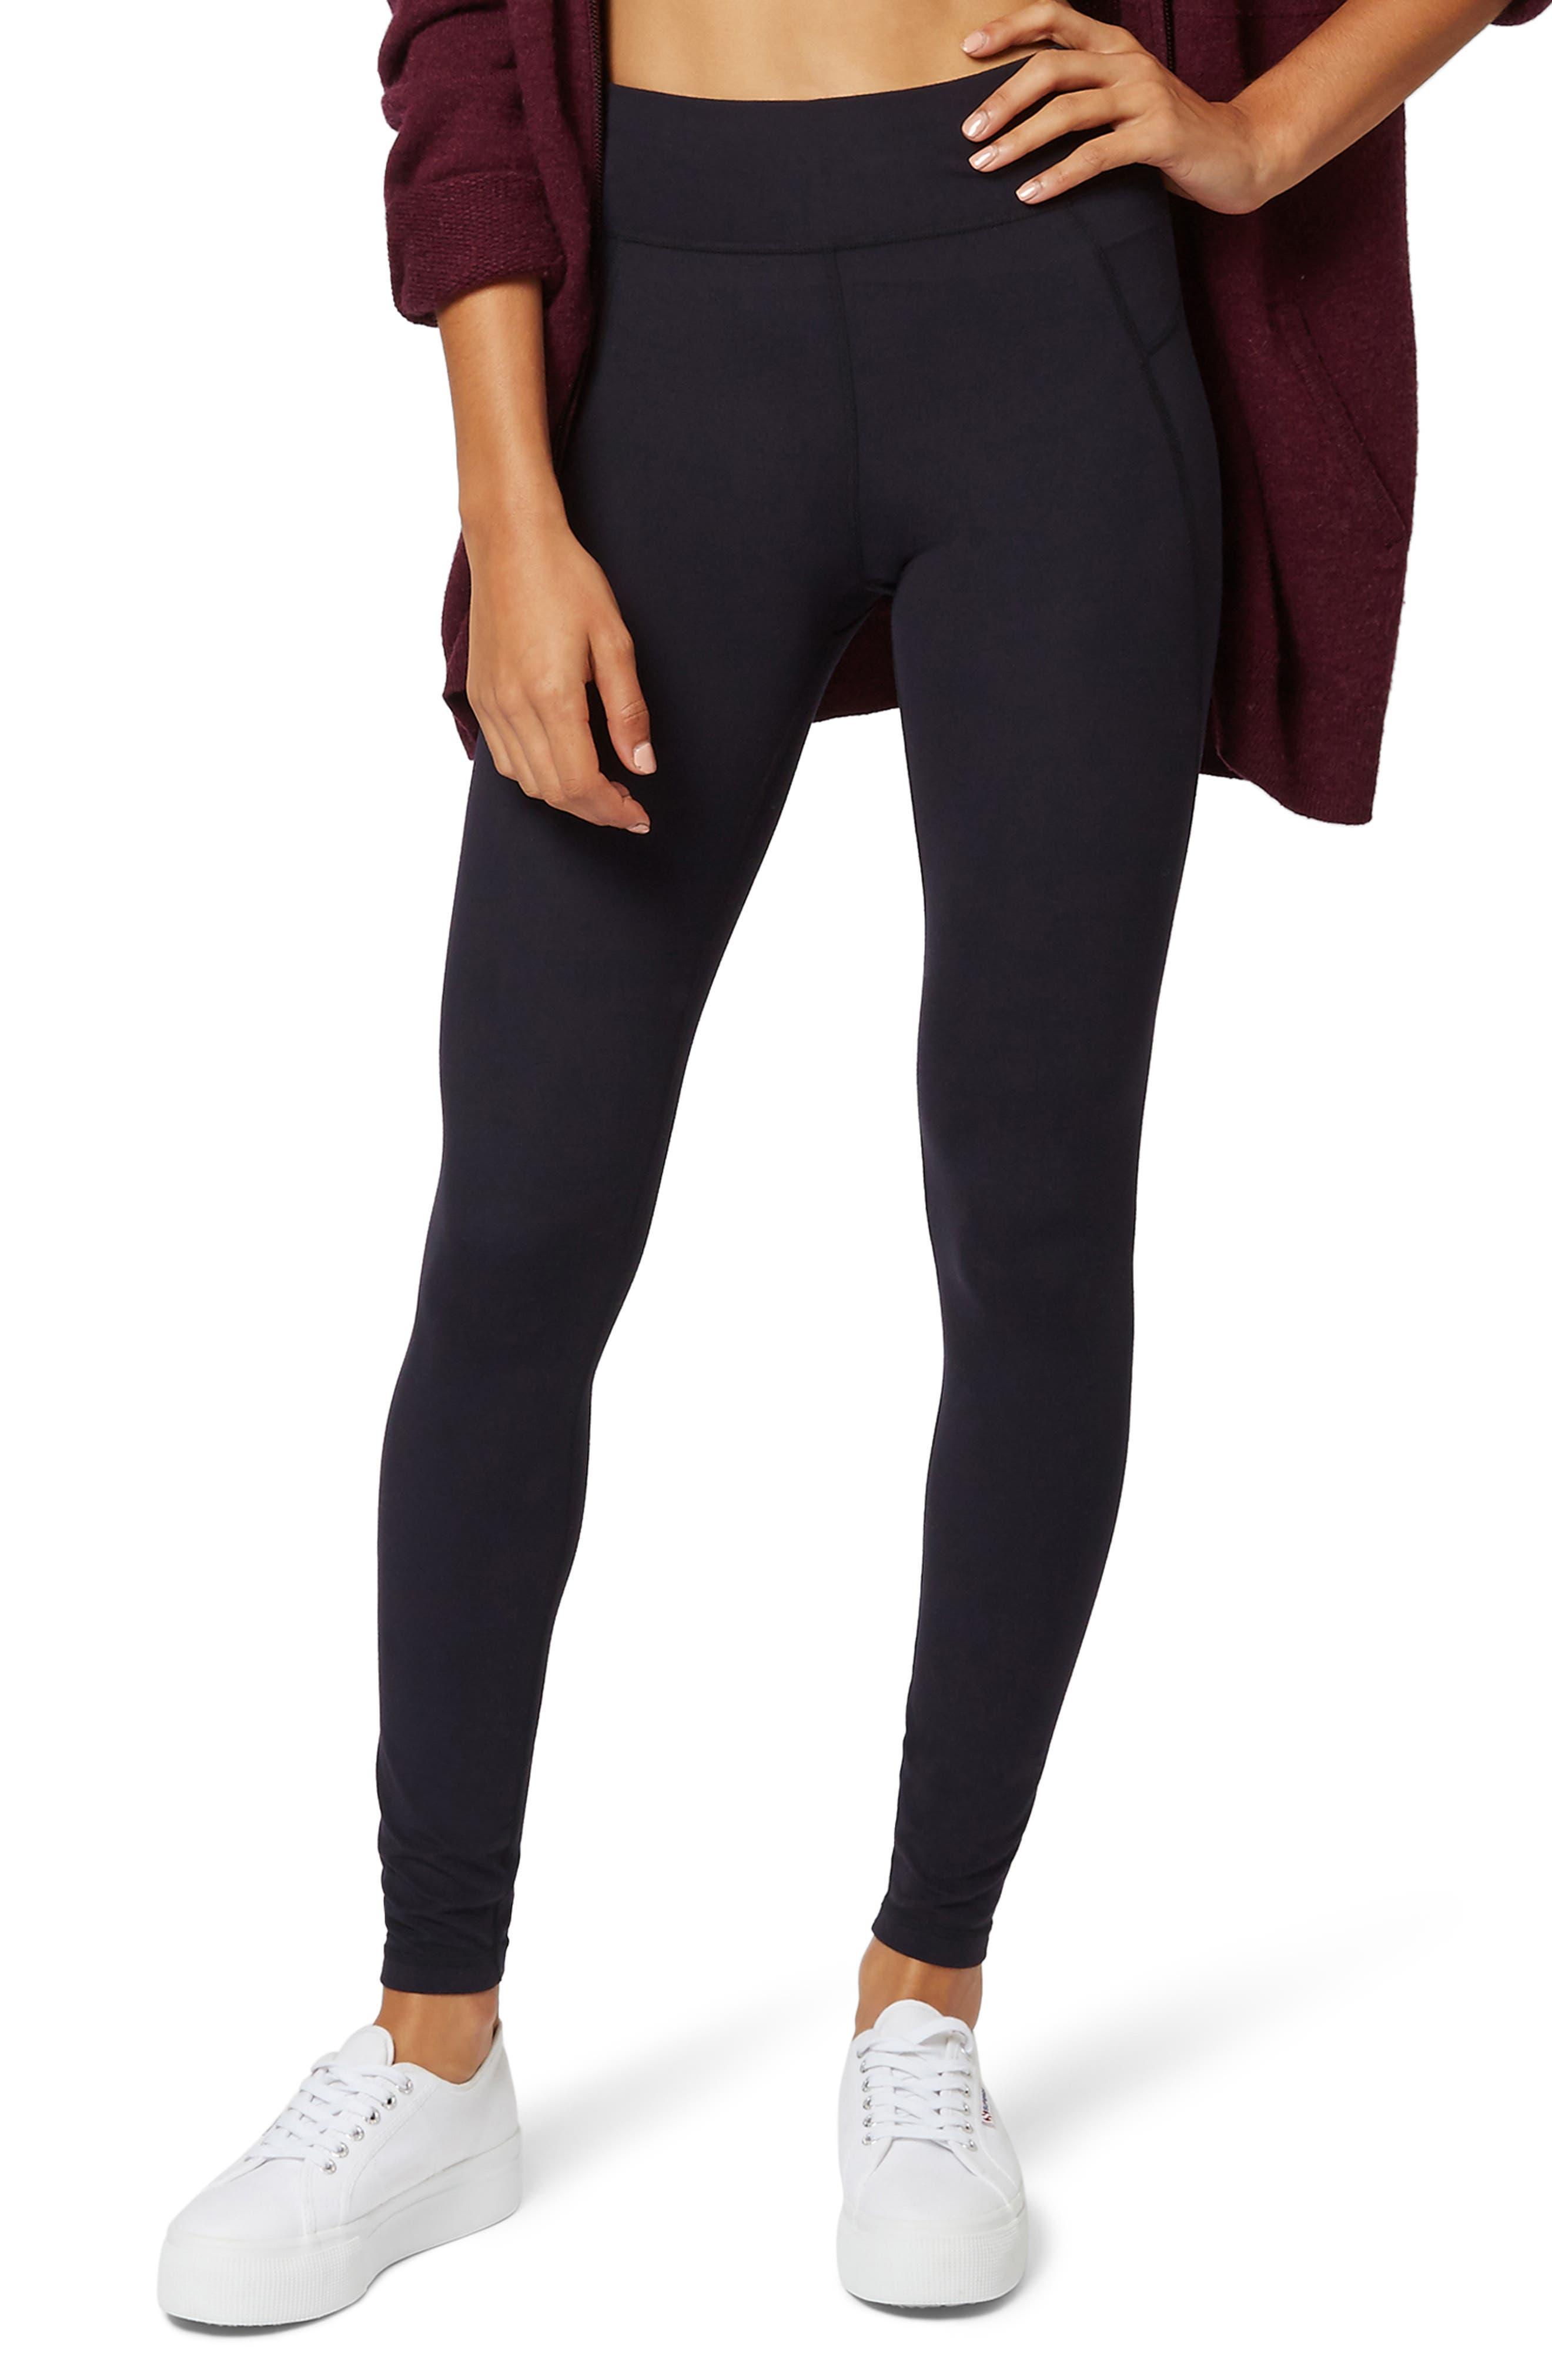 SWEATY BETTY Zen Yoga Leggings, Main, color, 001